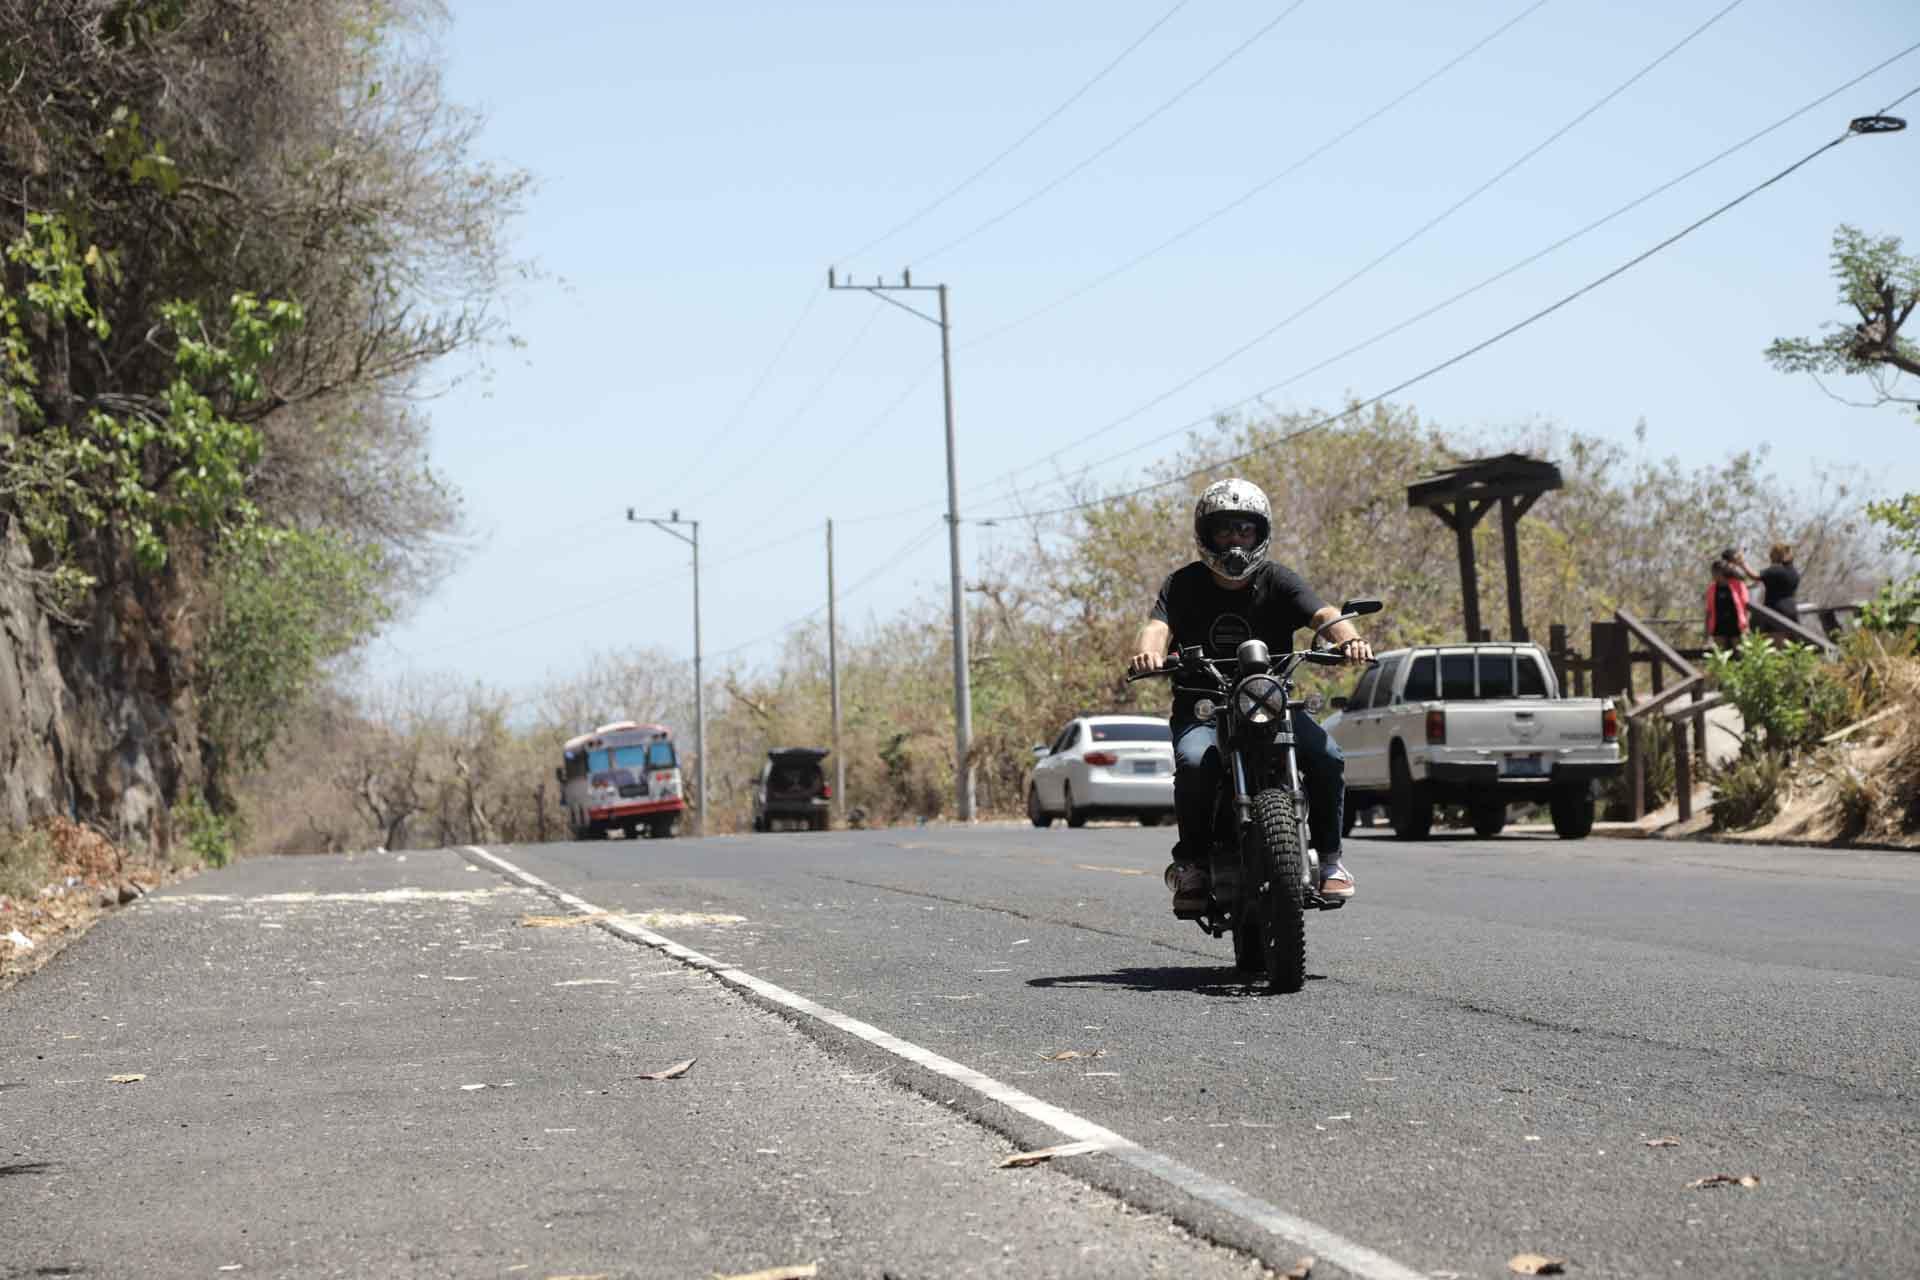 Olivier Dubois moto El Salvador